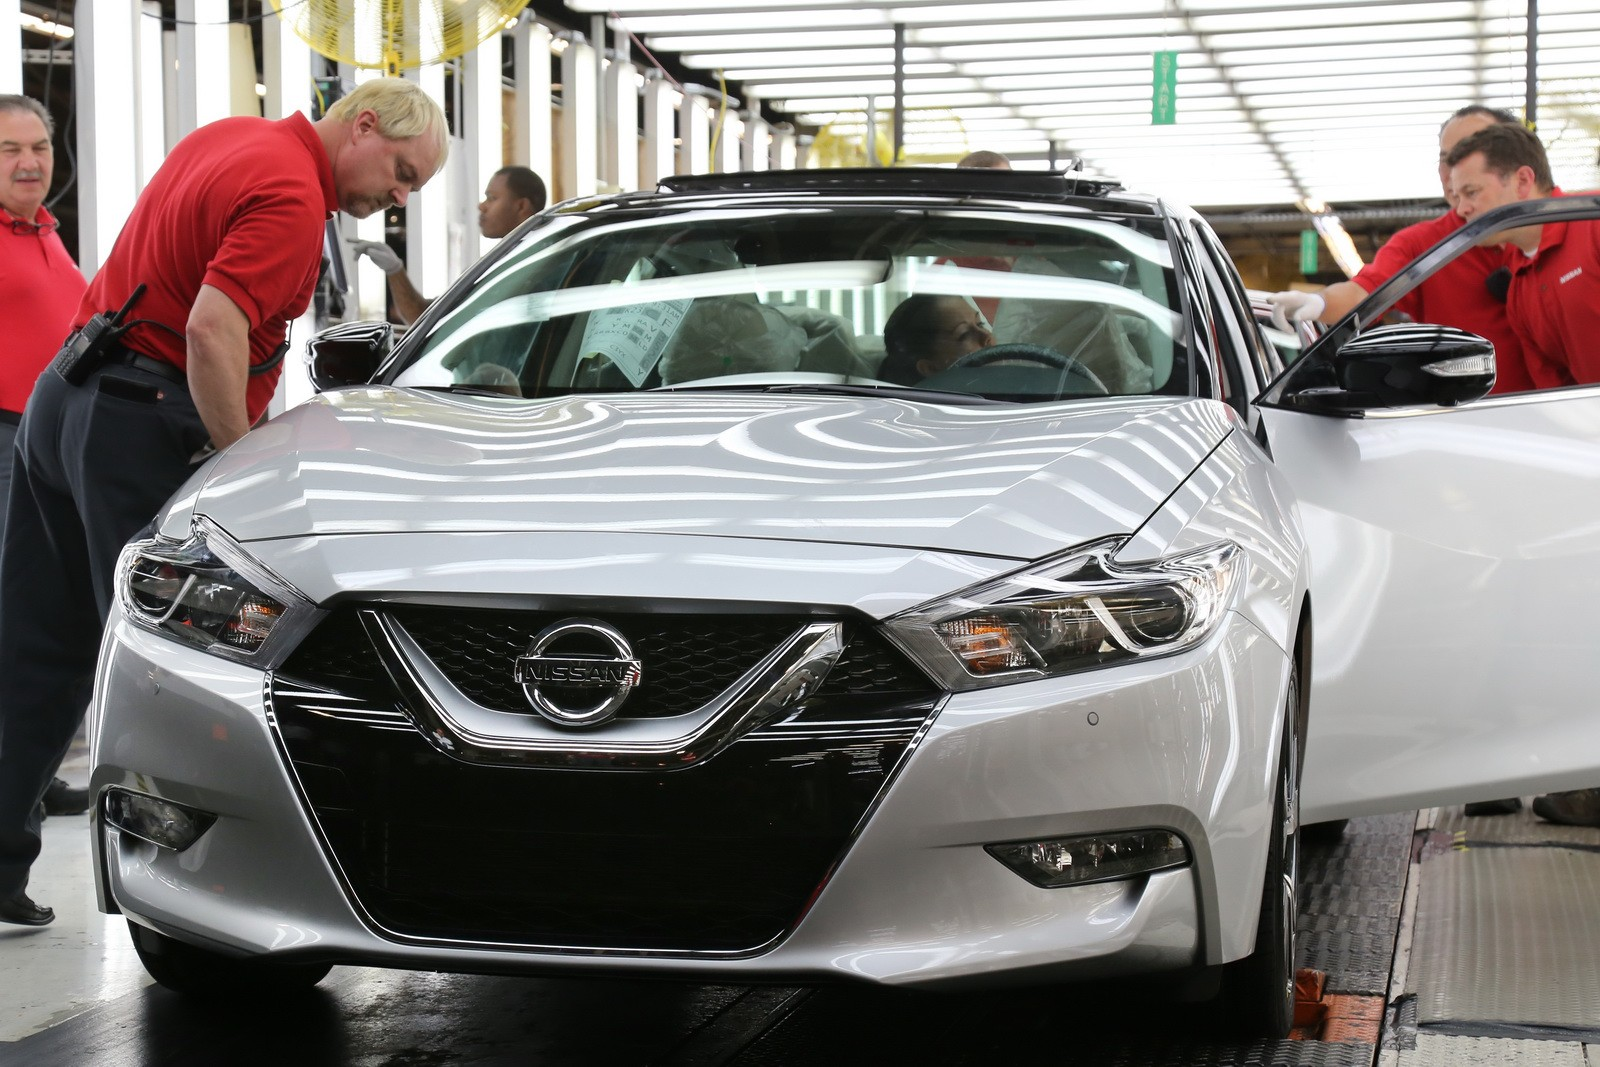 2003 Nissan Altima >> 2016 Nissan Maxima Production Kicks Off In Tennessee - autoevolution